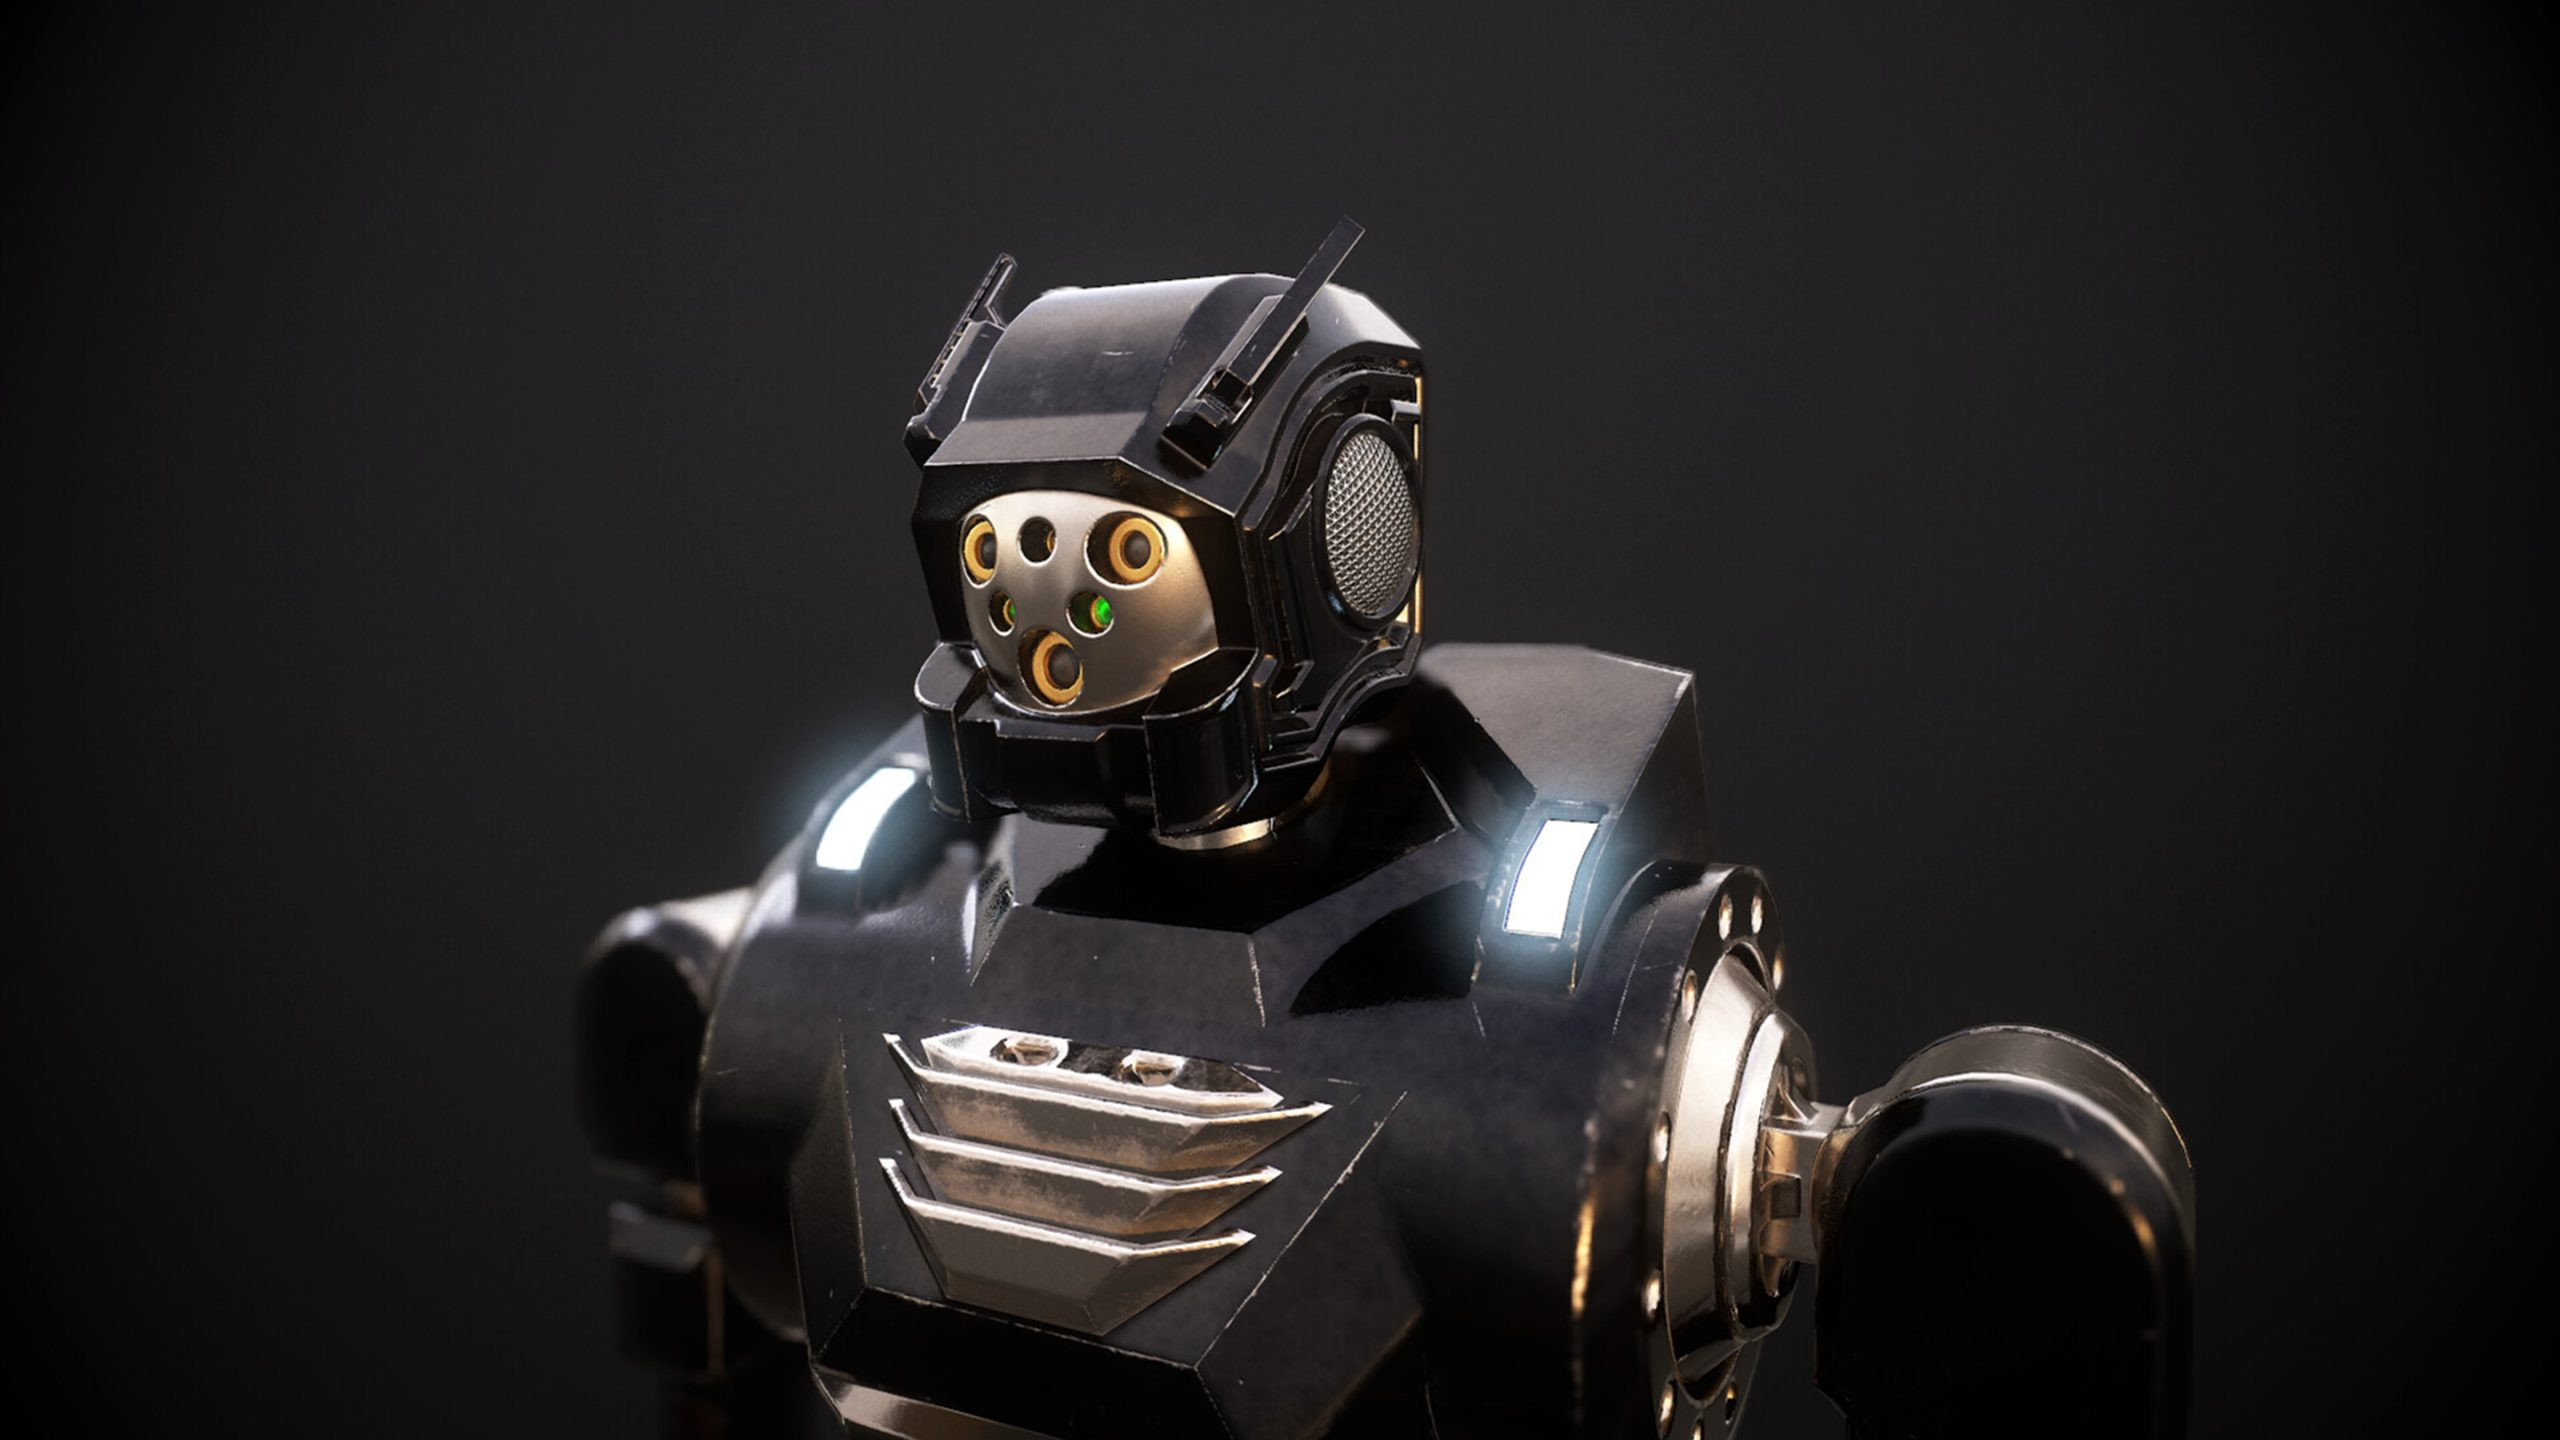 Shot rendered in Marmoset Toolbag, robot creation in Blender, ZBrush, Substance Painter